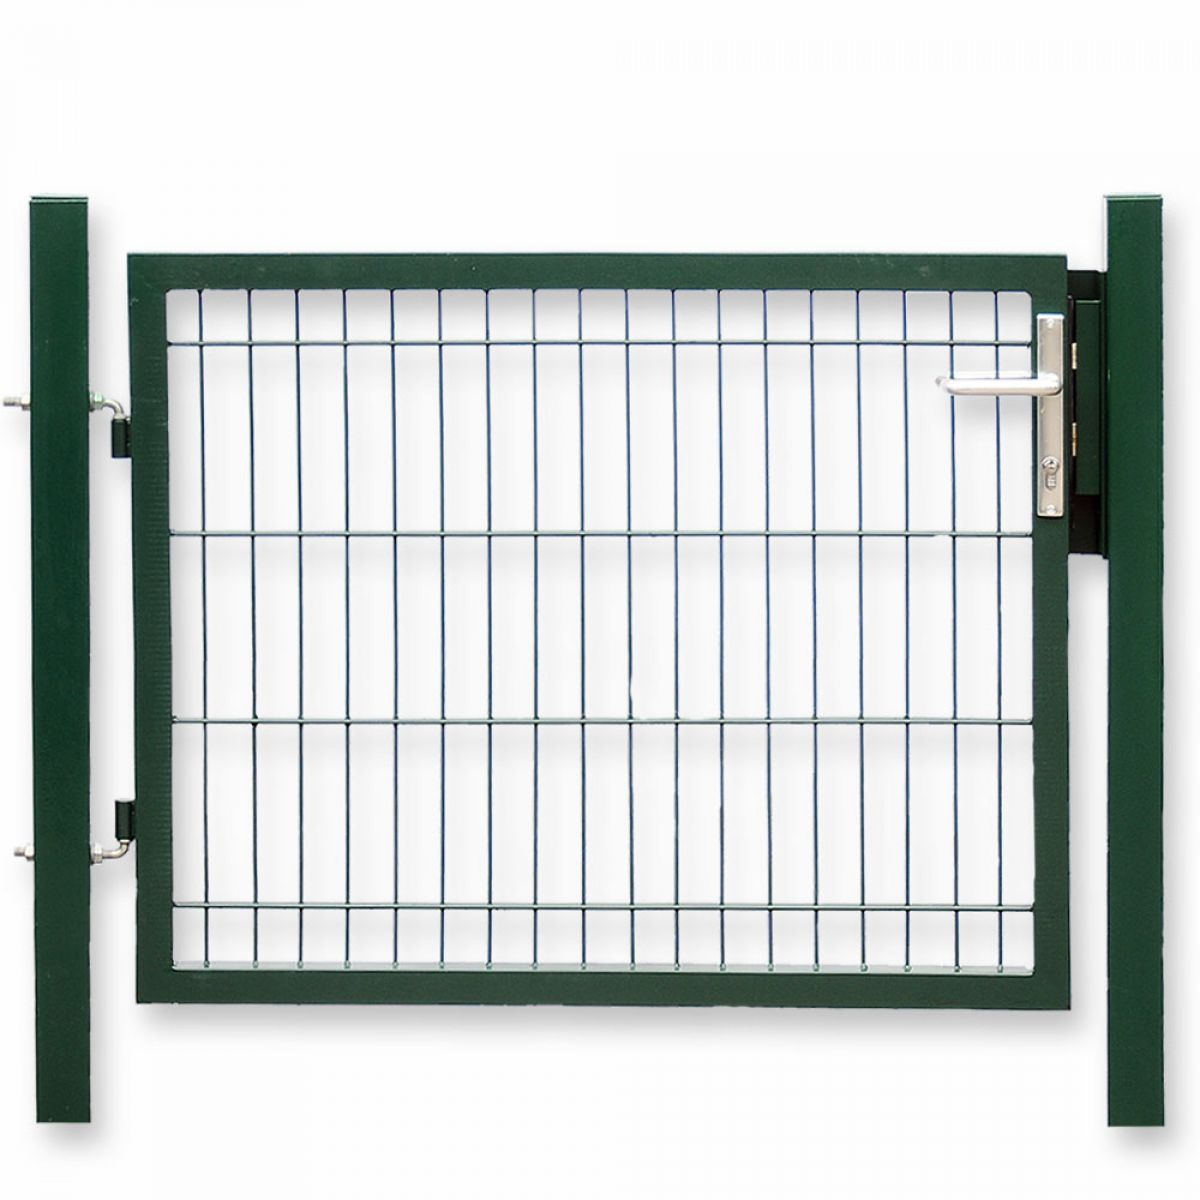 Zaun Nagel Moderner Sichtschutz Doppelstabmattenzaun